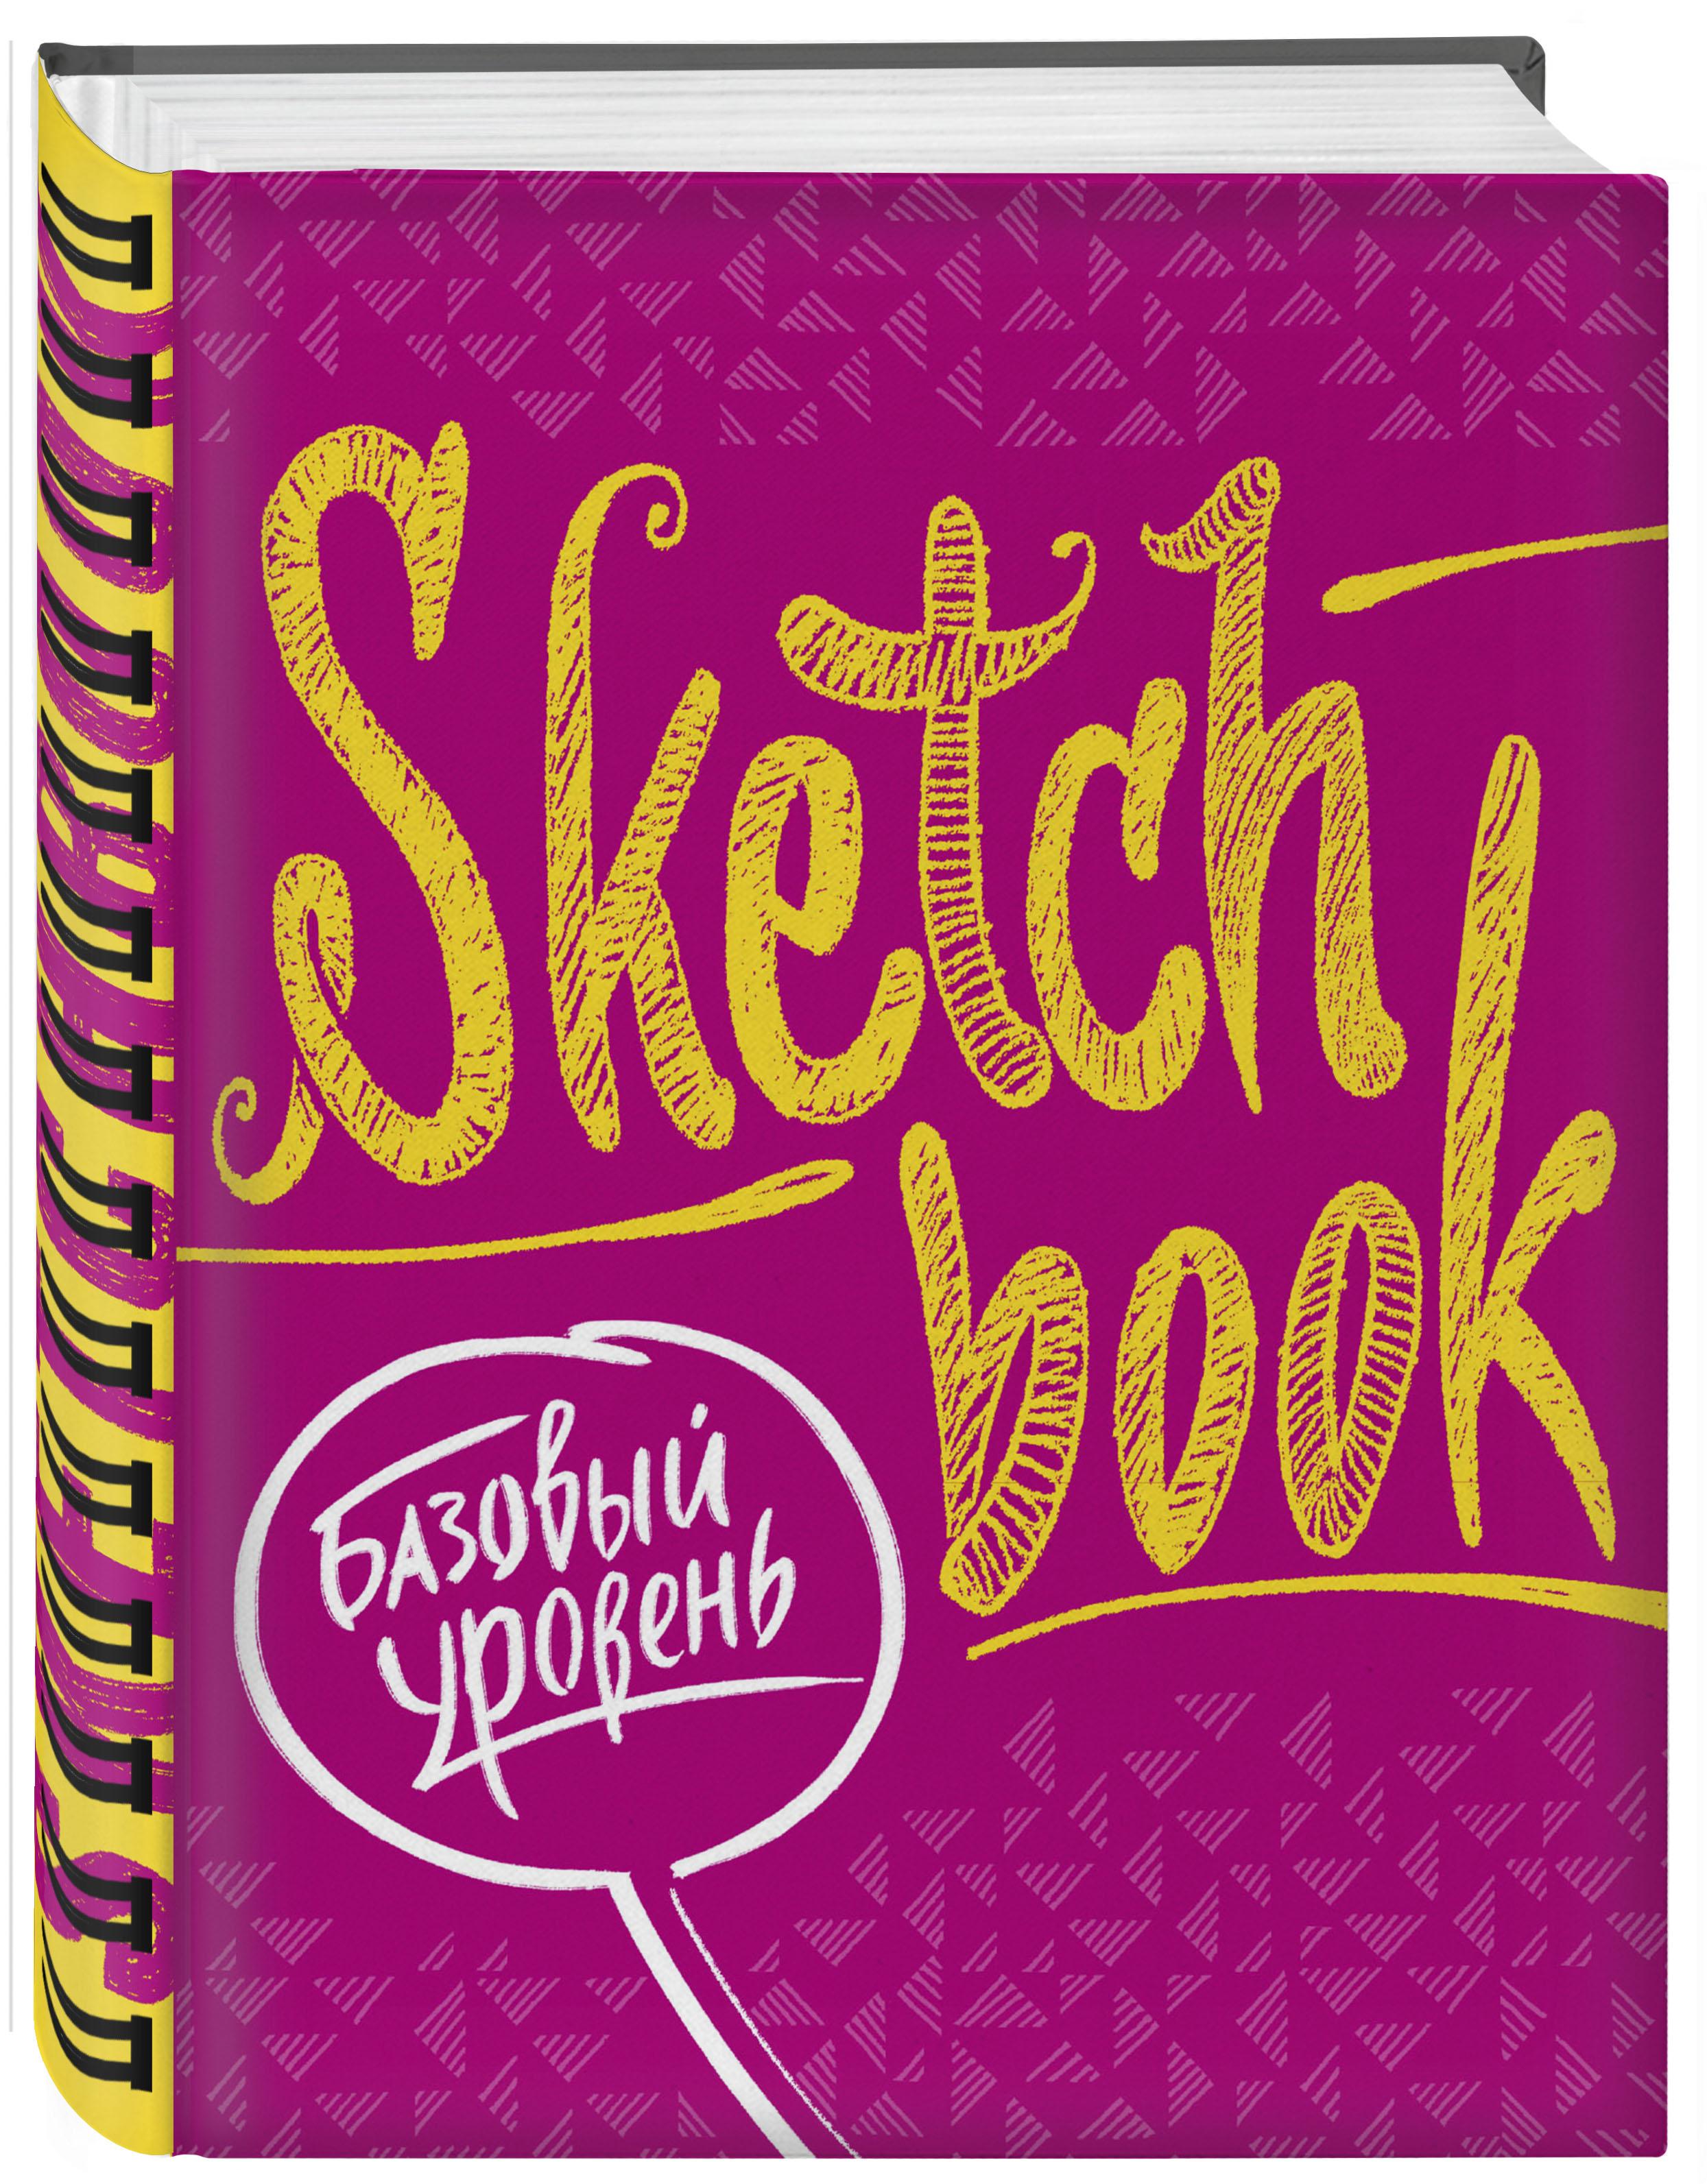 SketchBook. Базовый уровень (фуксия) a831bfbb353